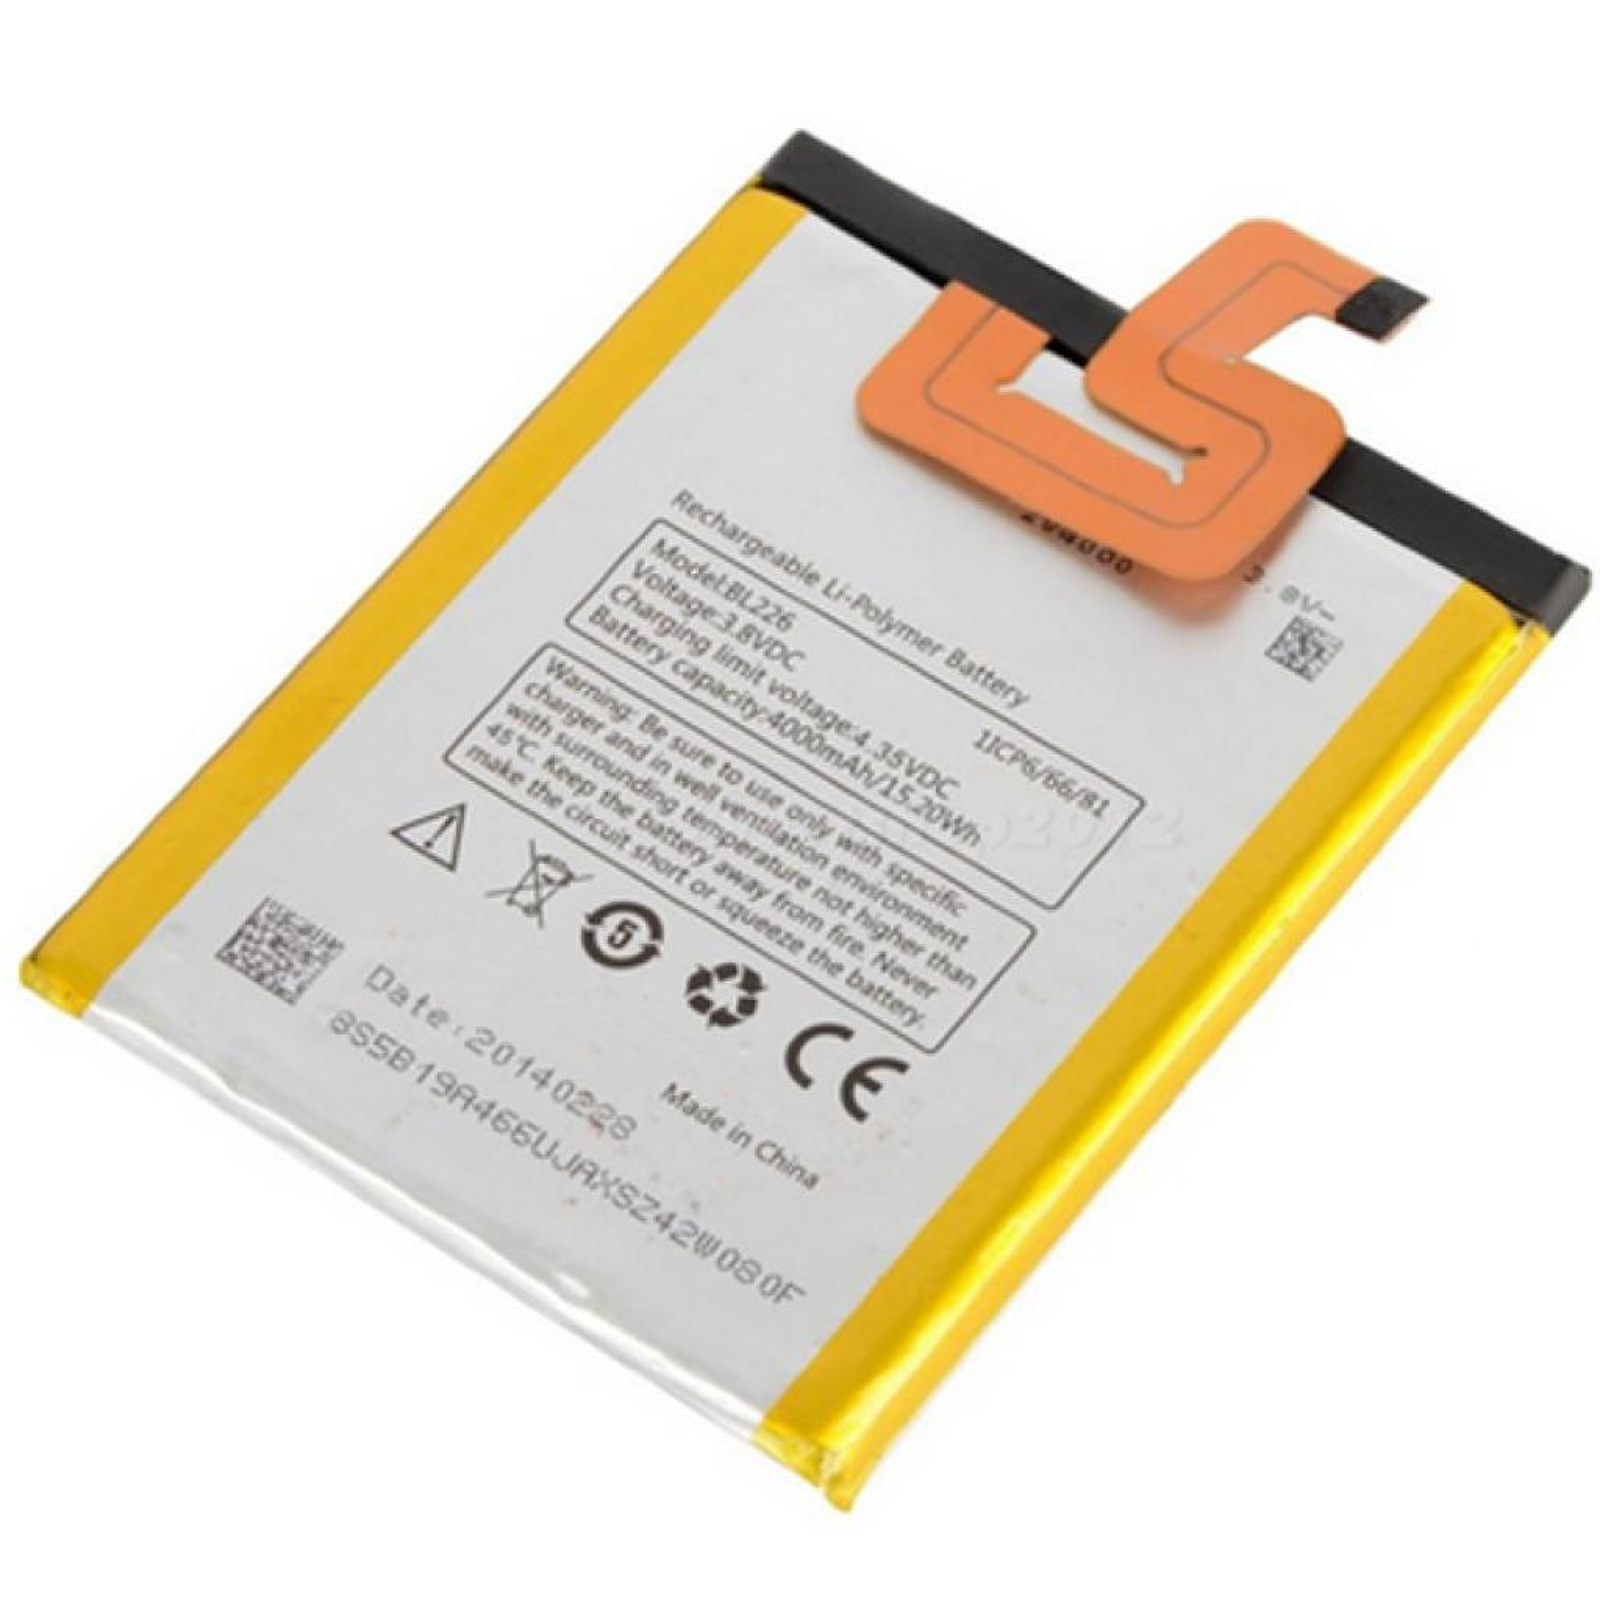 Аккумуляторная батарея Lenovo for S860 (BL-226 / 29719)